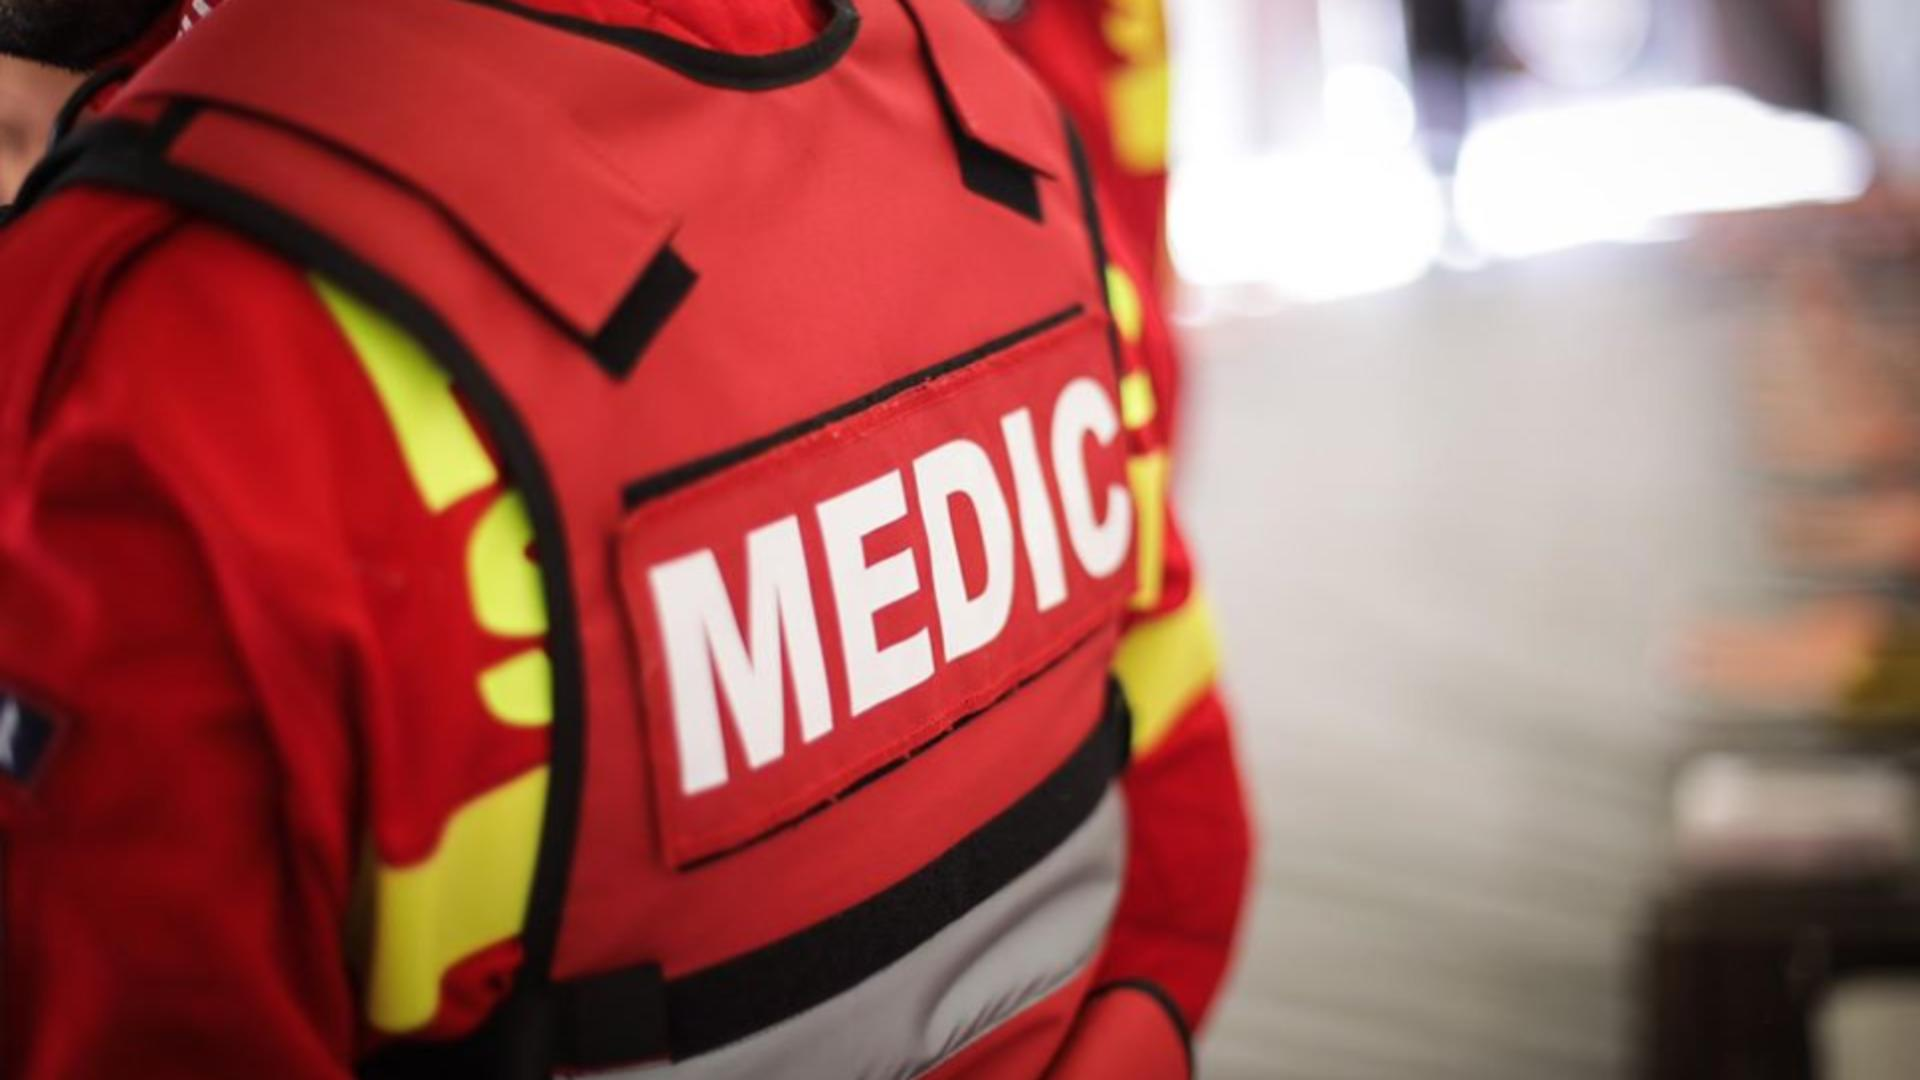 Un tânăr din județul Prahova a fost rănit grav